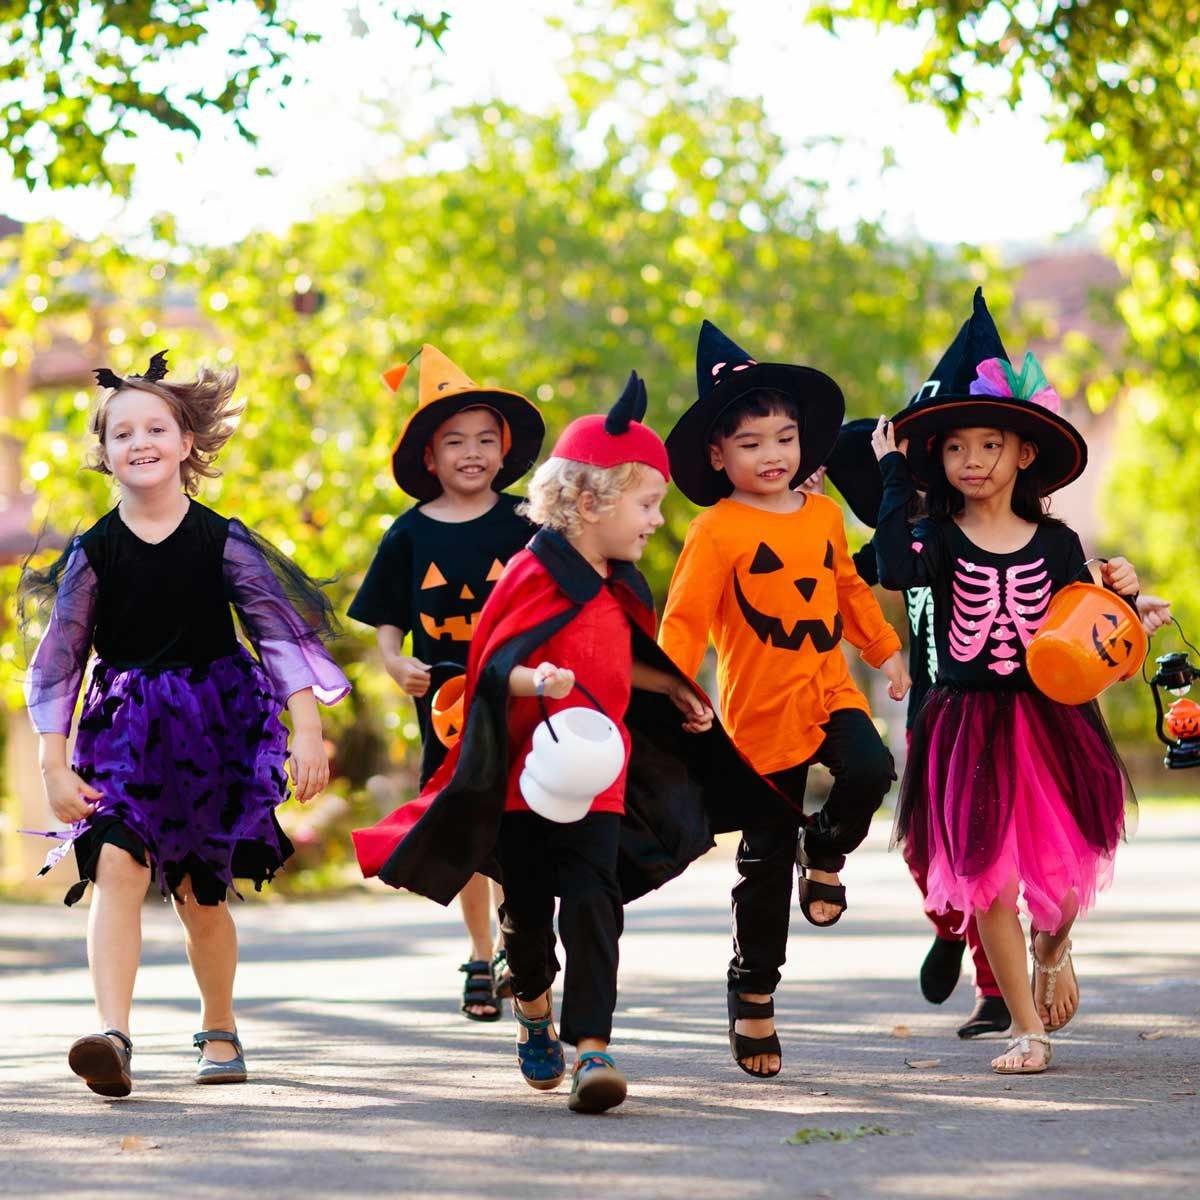 15 Best Halloween Costume Ideas for Kids